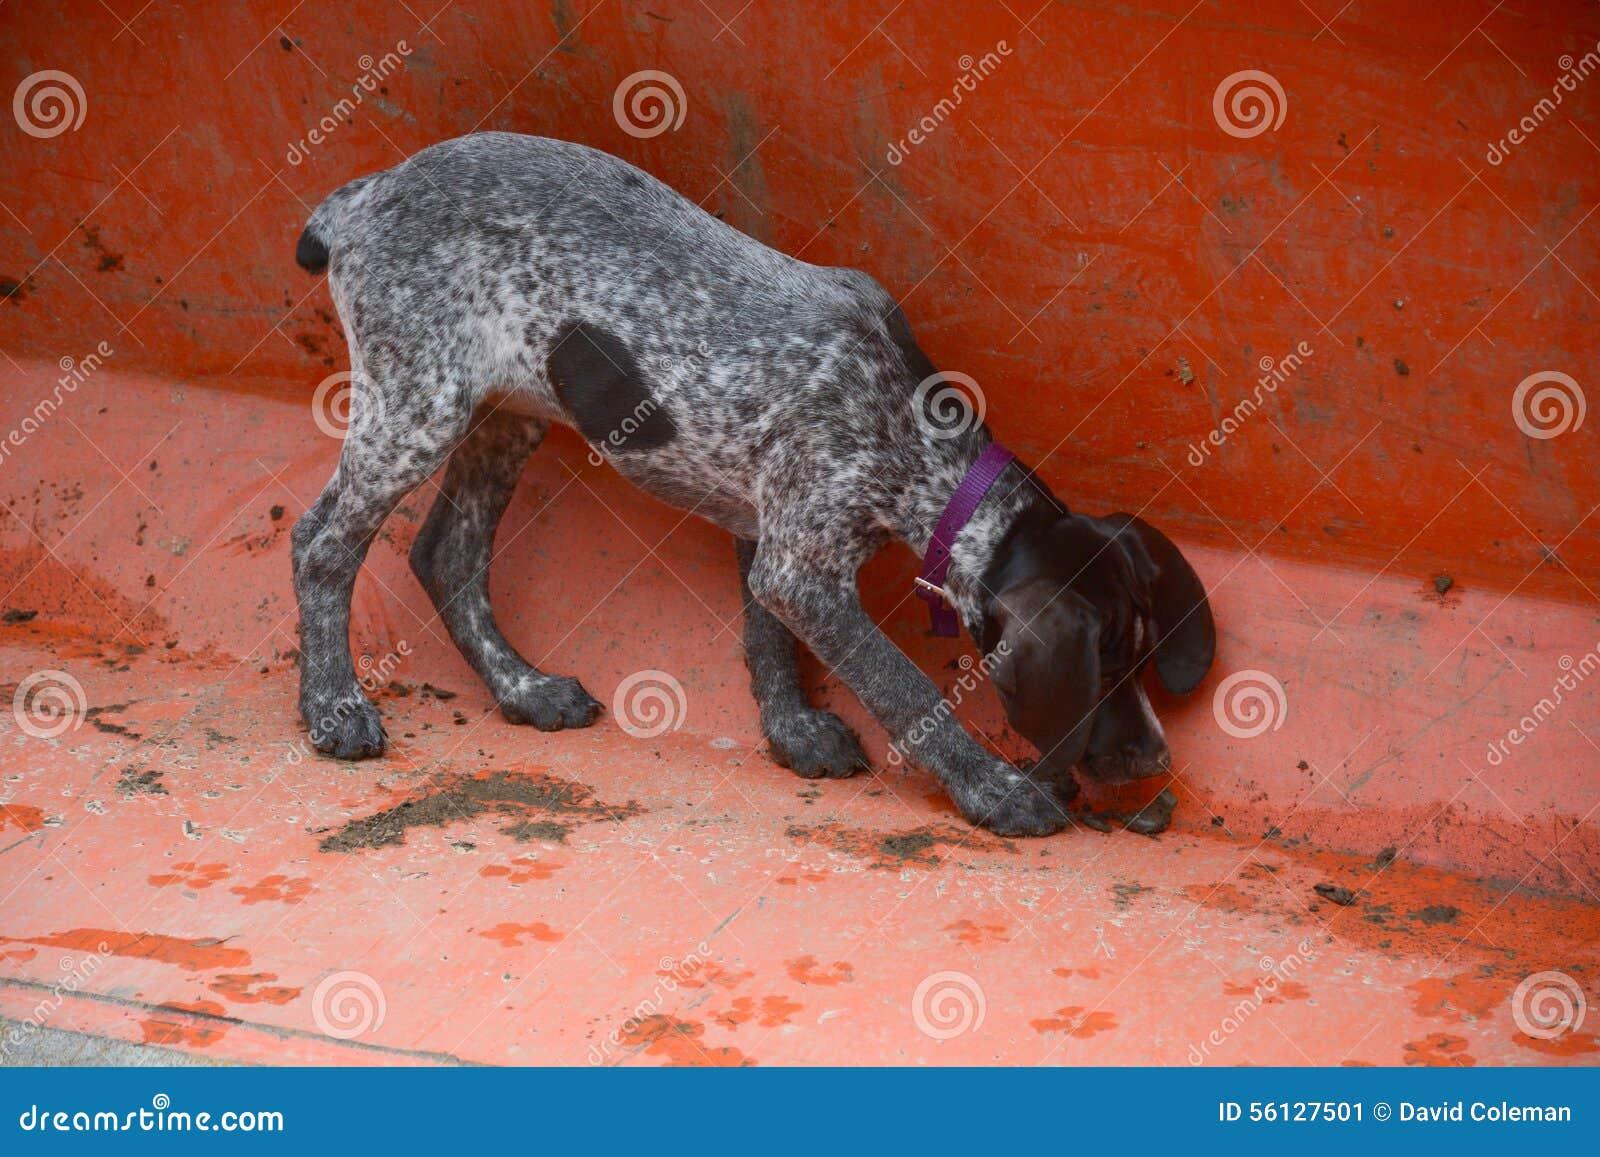 Ведро обнюхивать щенка